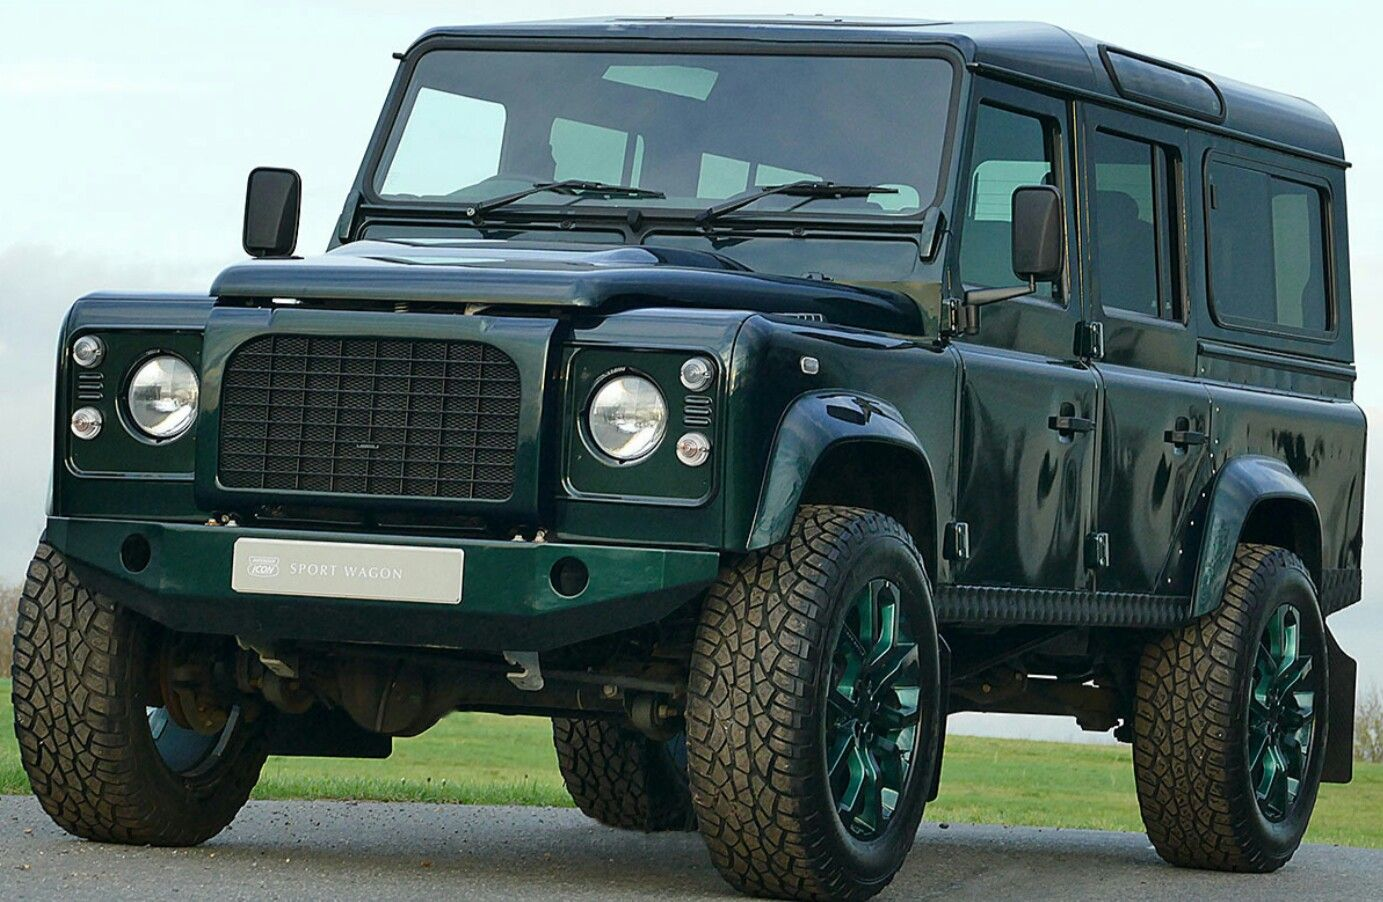 Green Land Rover defender Sport wagon Land rover